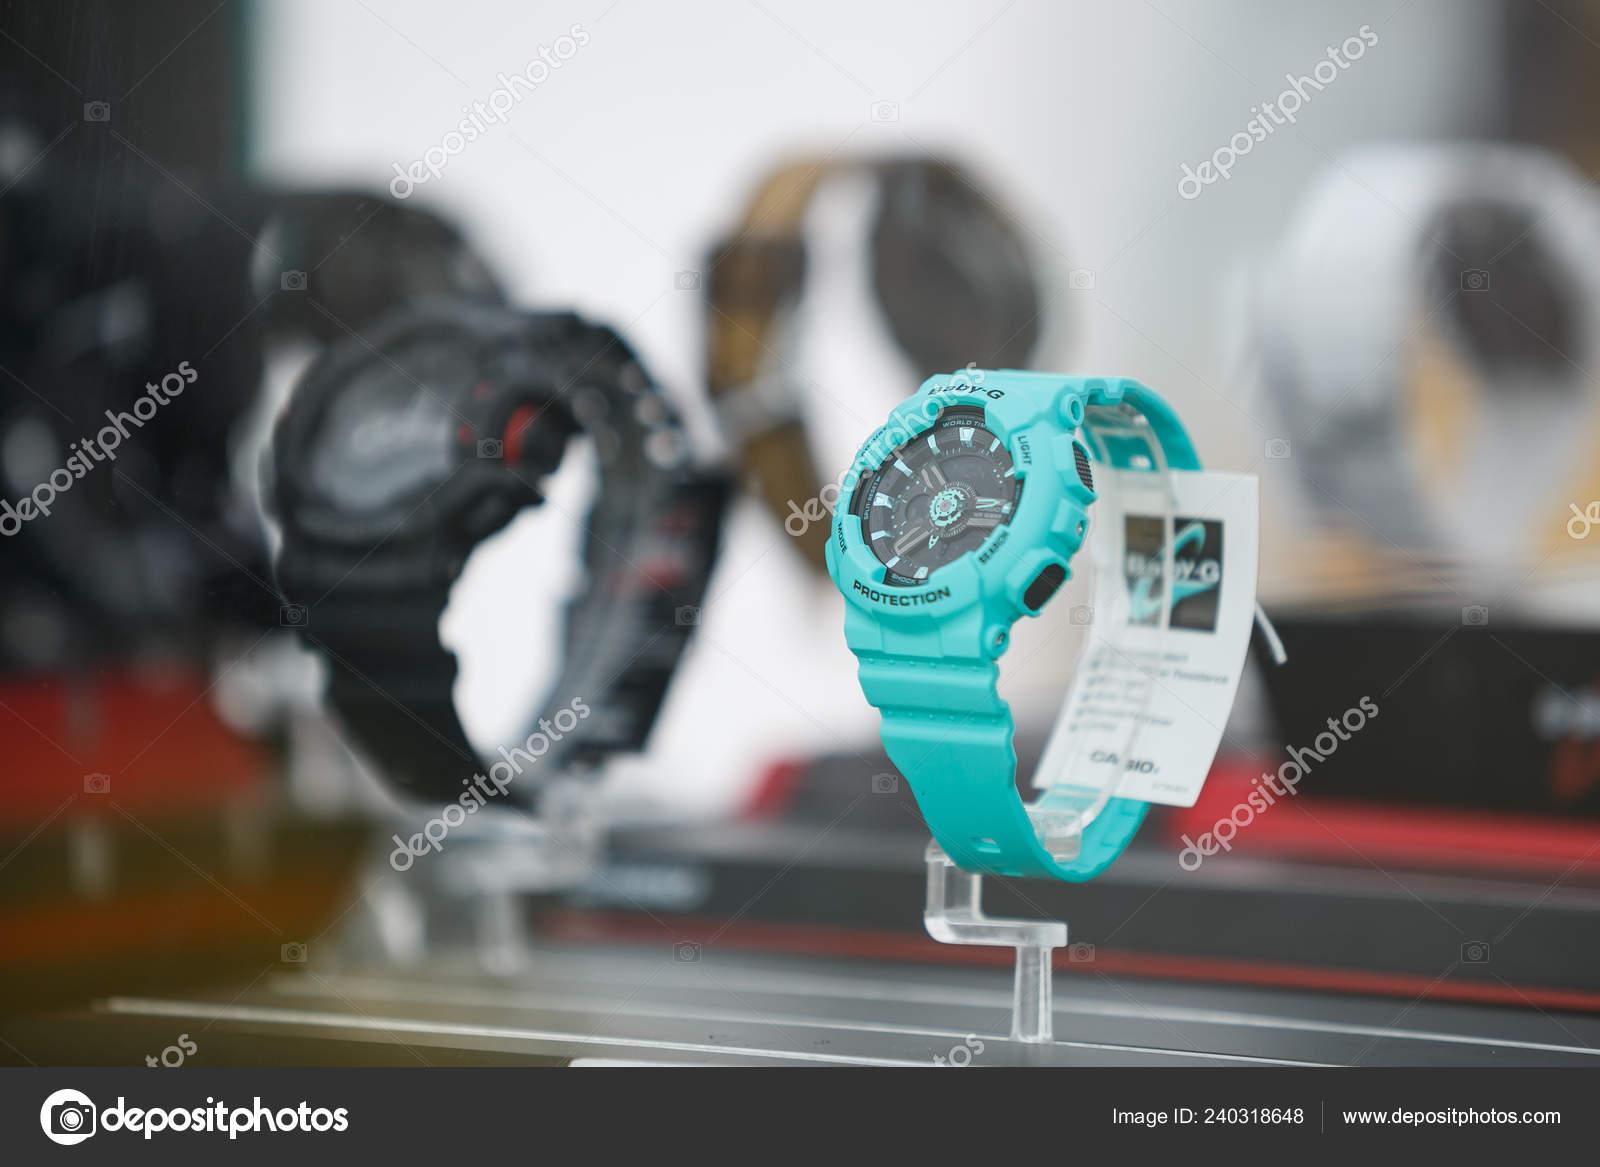 Casio Odessa 2017 Shock Agosto Venta Ucrania Nuevo Tienda Relojes CWxBoerd